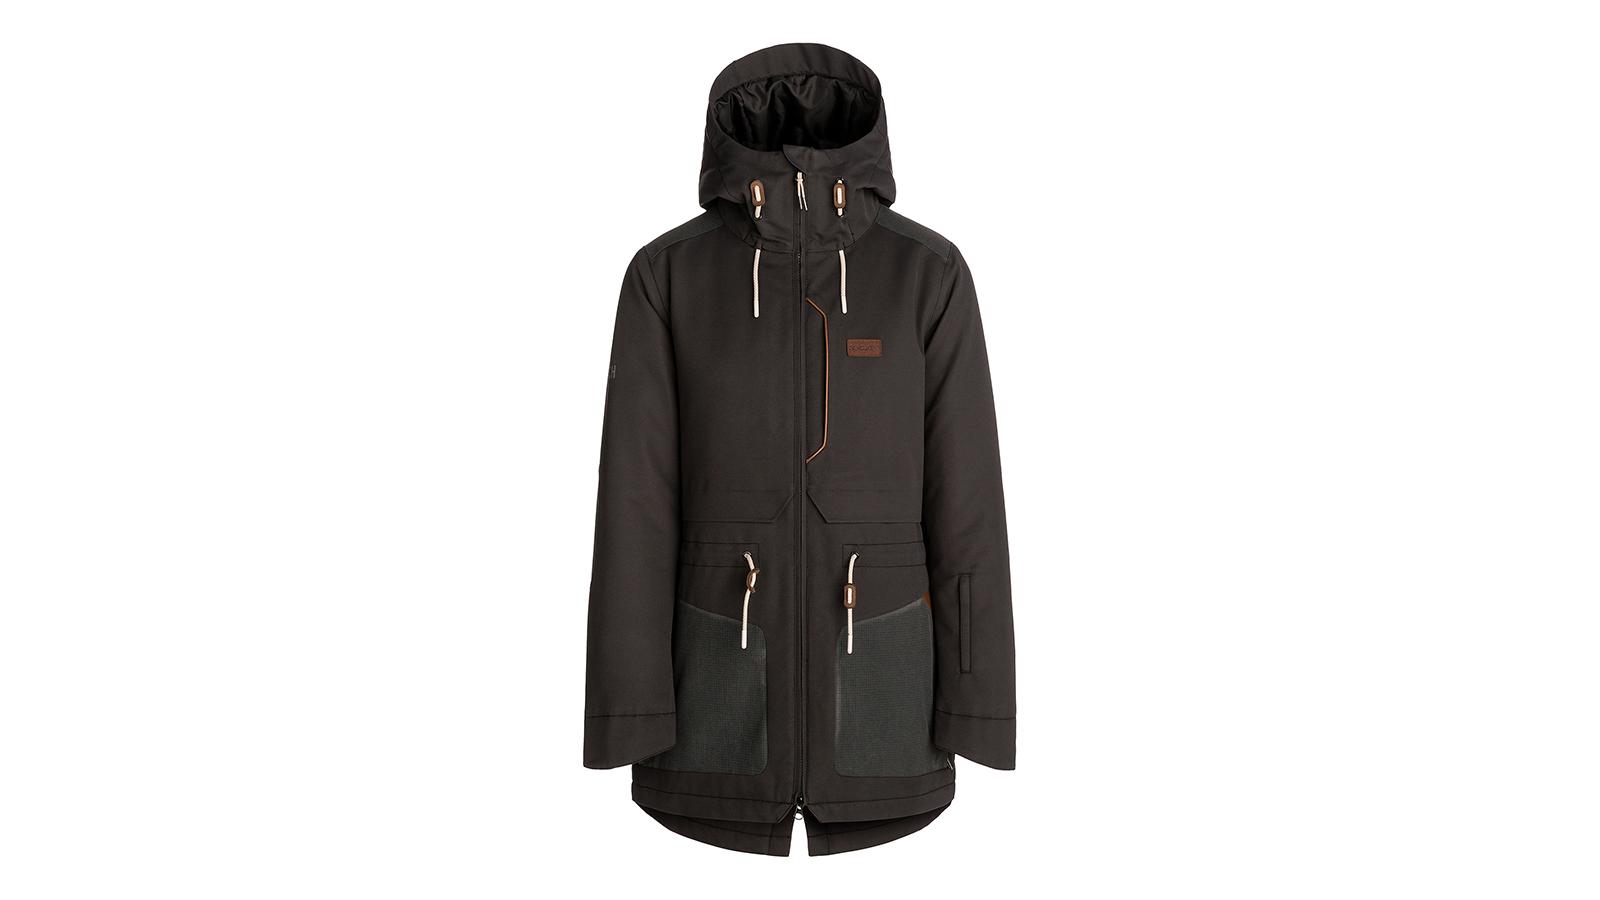 Ripcurl-Aminty-Jacket